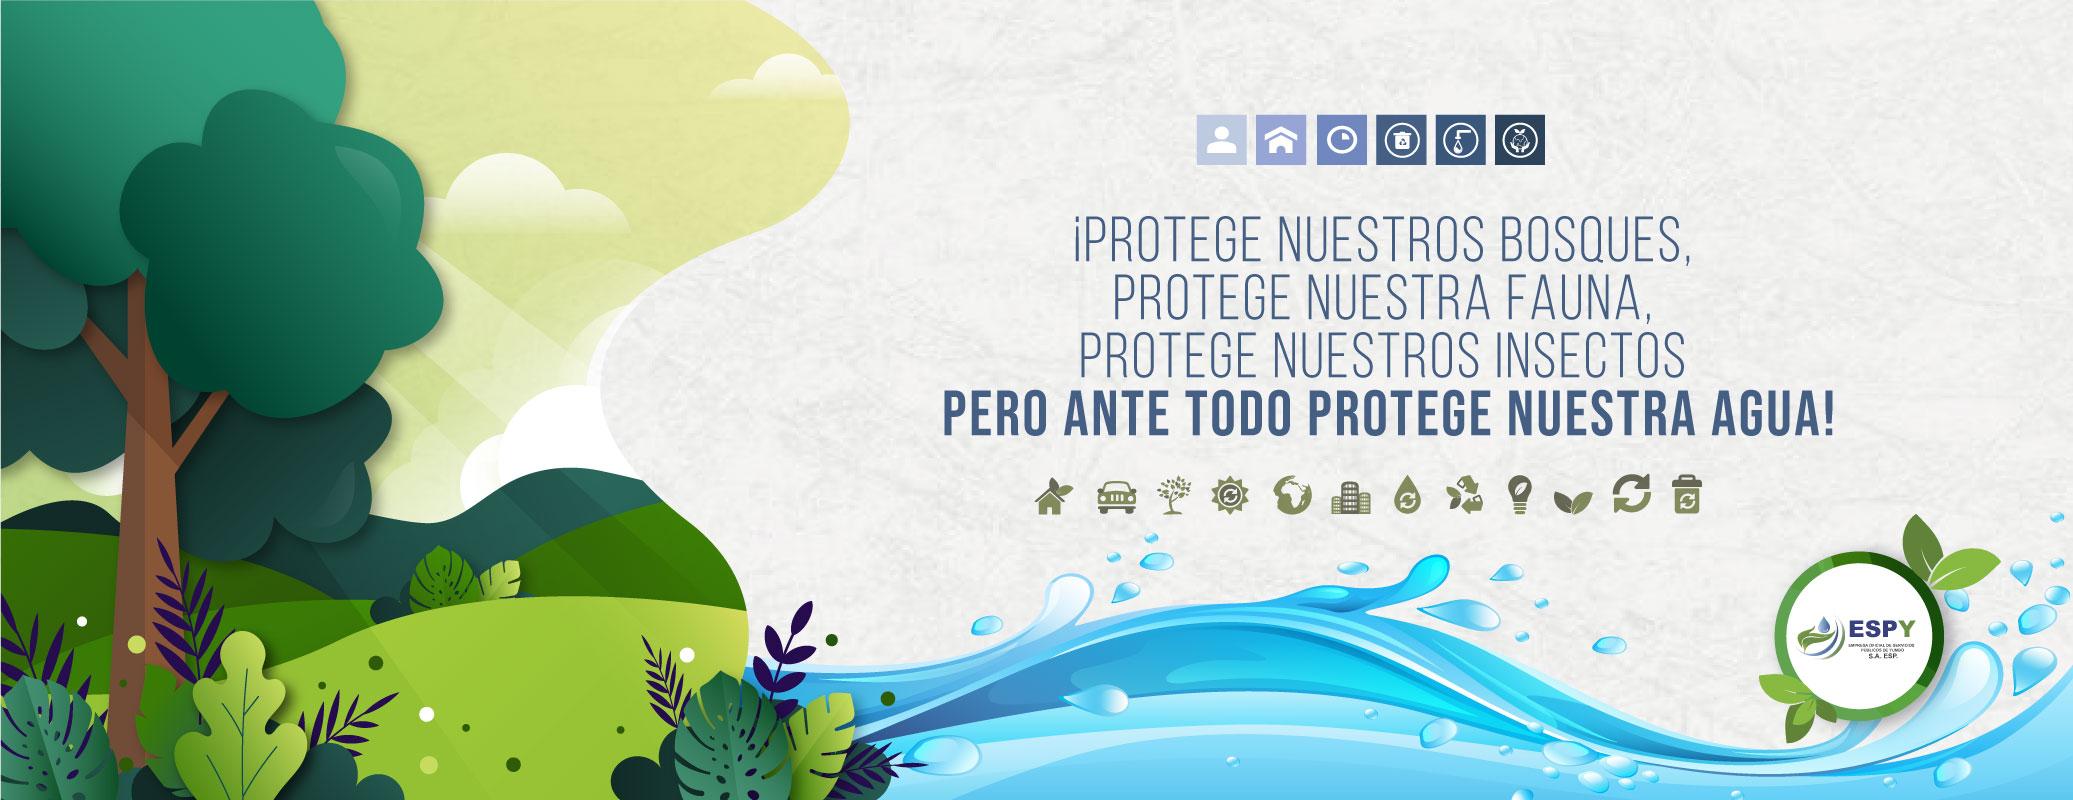 Protege-nuestra-agua-20102020